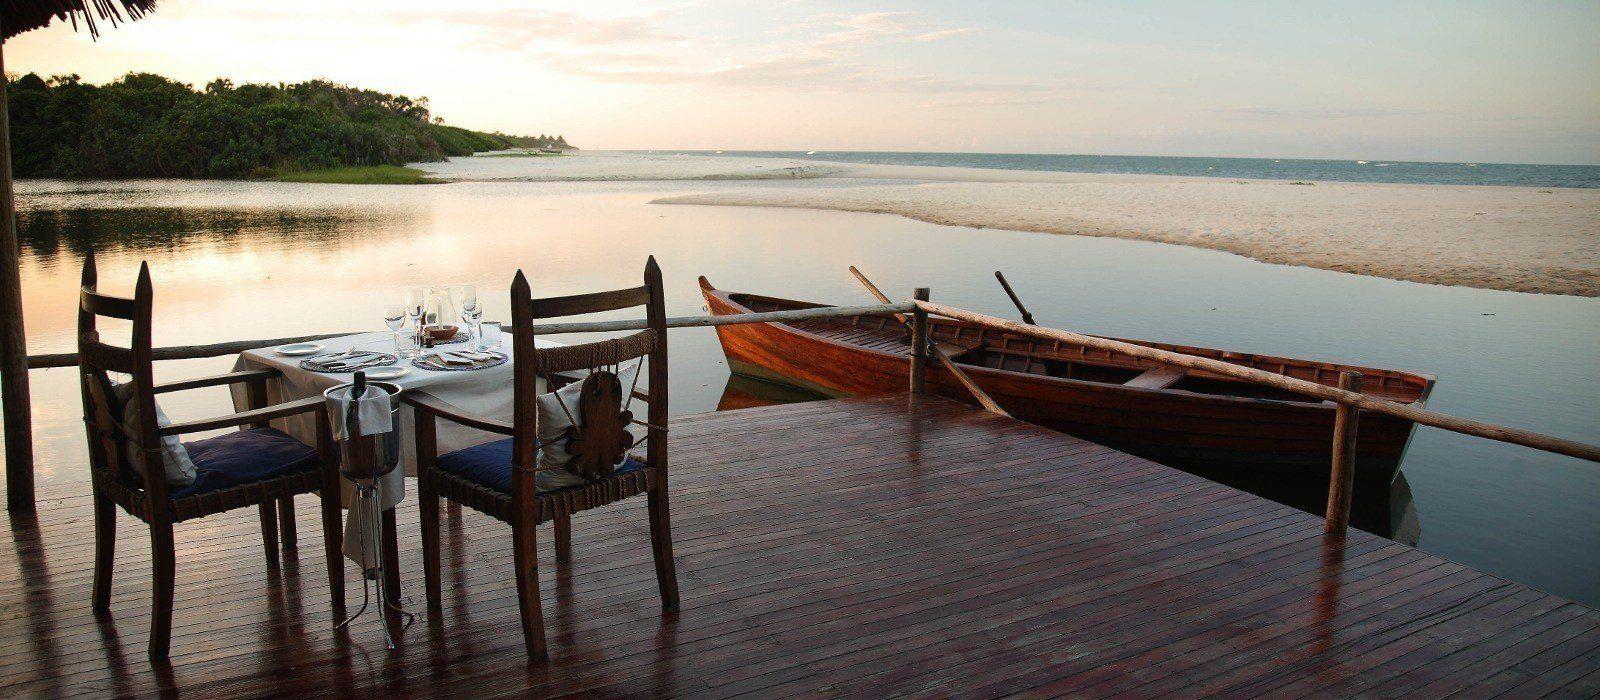 Tanzania – Southern Wilderness and Beach Tour Trip 7